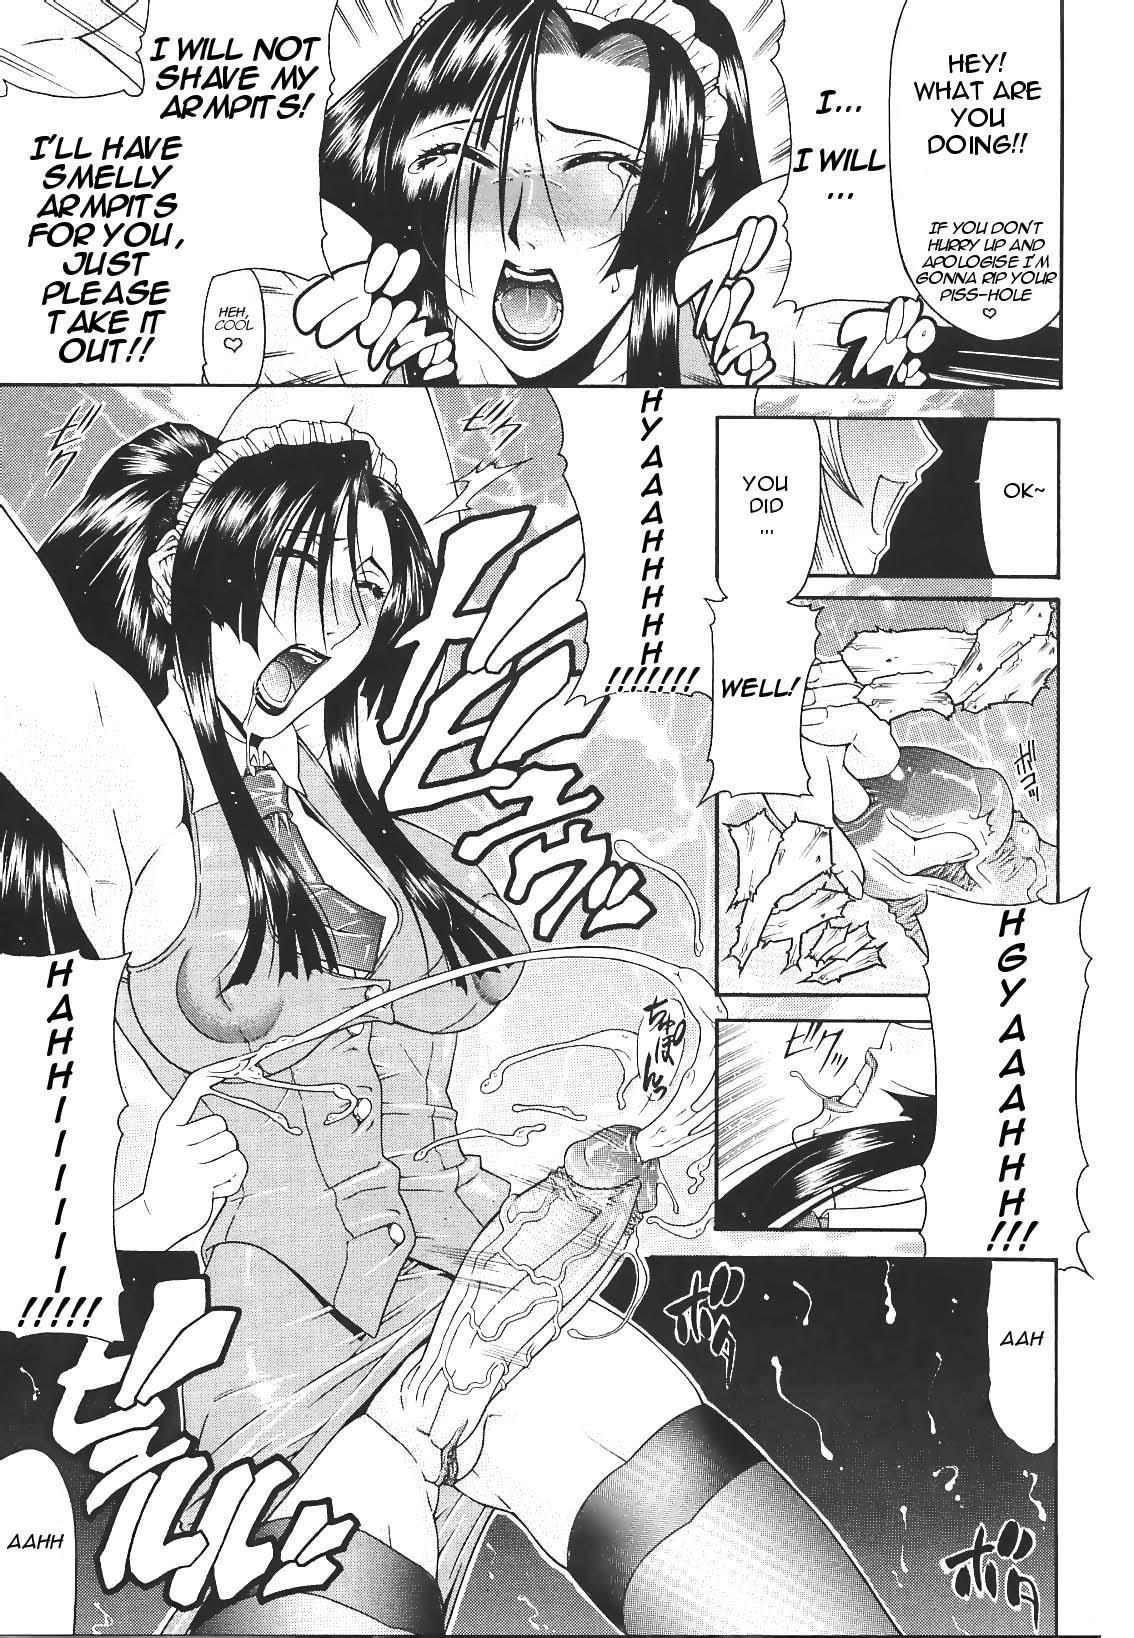 Gura Nyuutou - Escape chapter 7 14